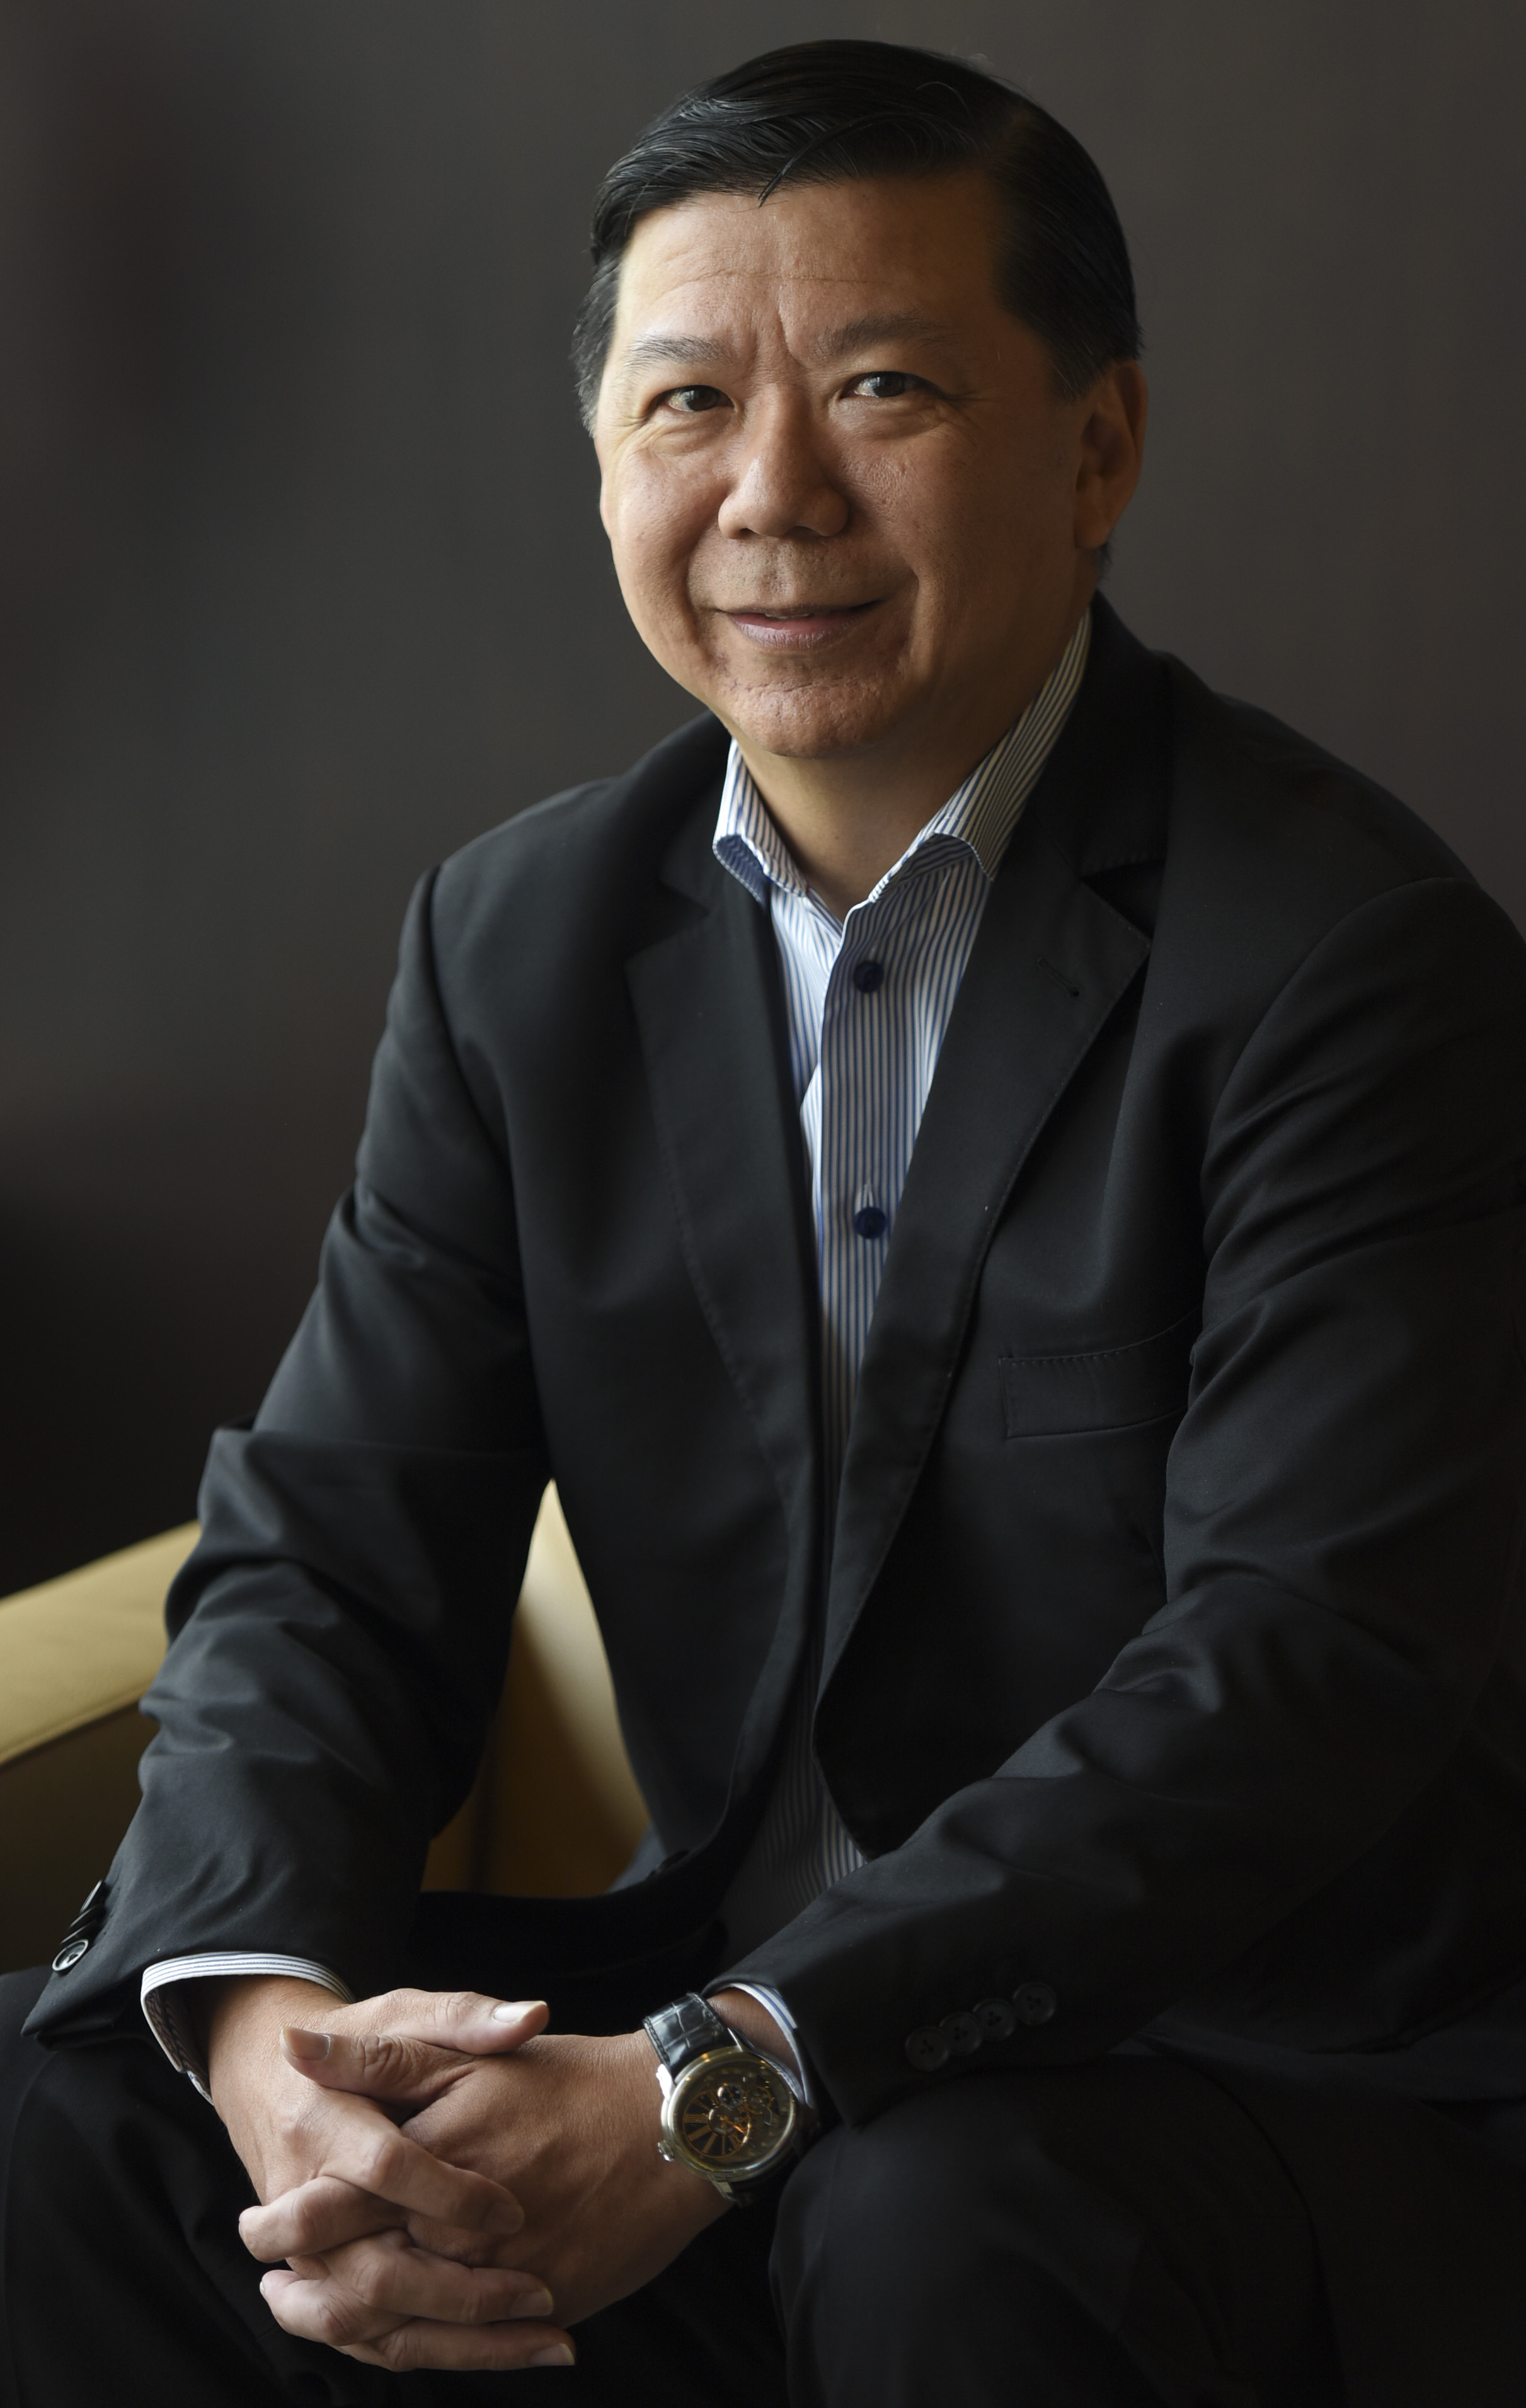 PATRICK ANG  Deputy Managing Partner of Rajah & Tann Singapore; Chief Executive Officer of Rajah & Tann Asia